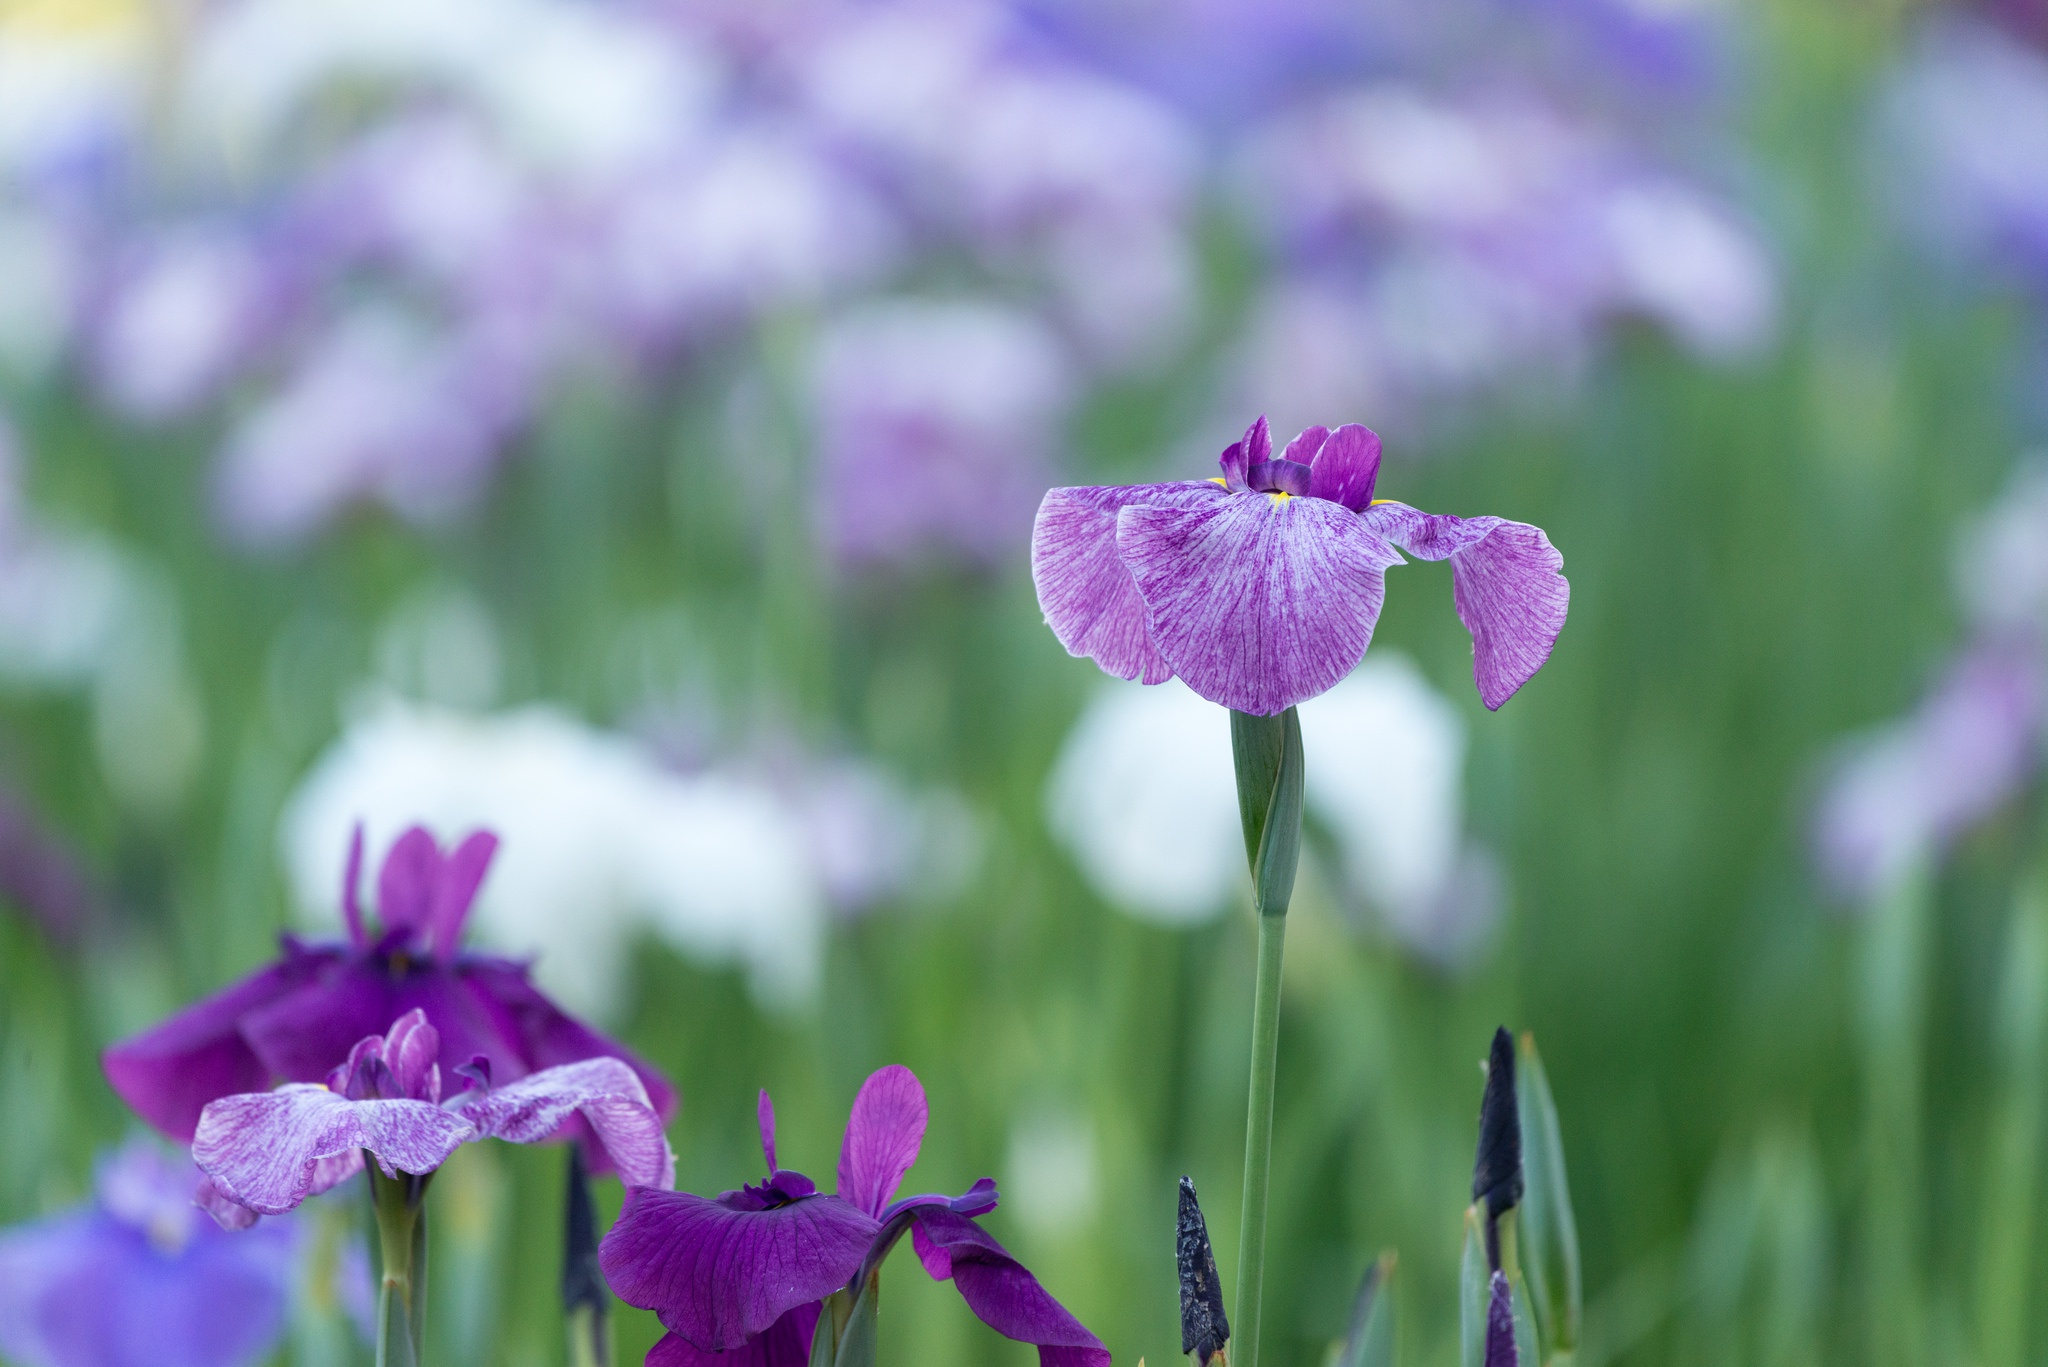 шмель,ирис,цветок,лето  № 529507 бесплатно